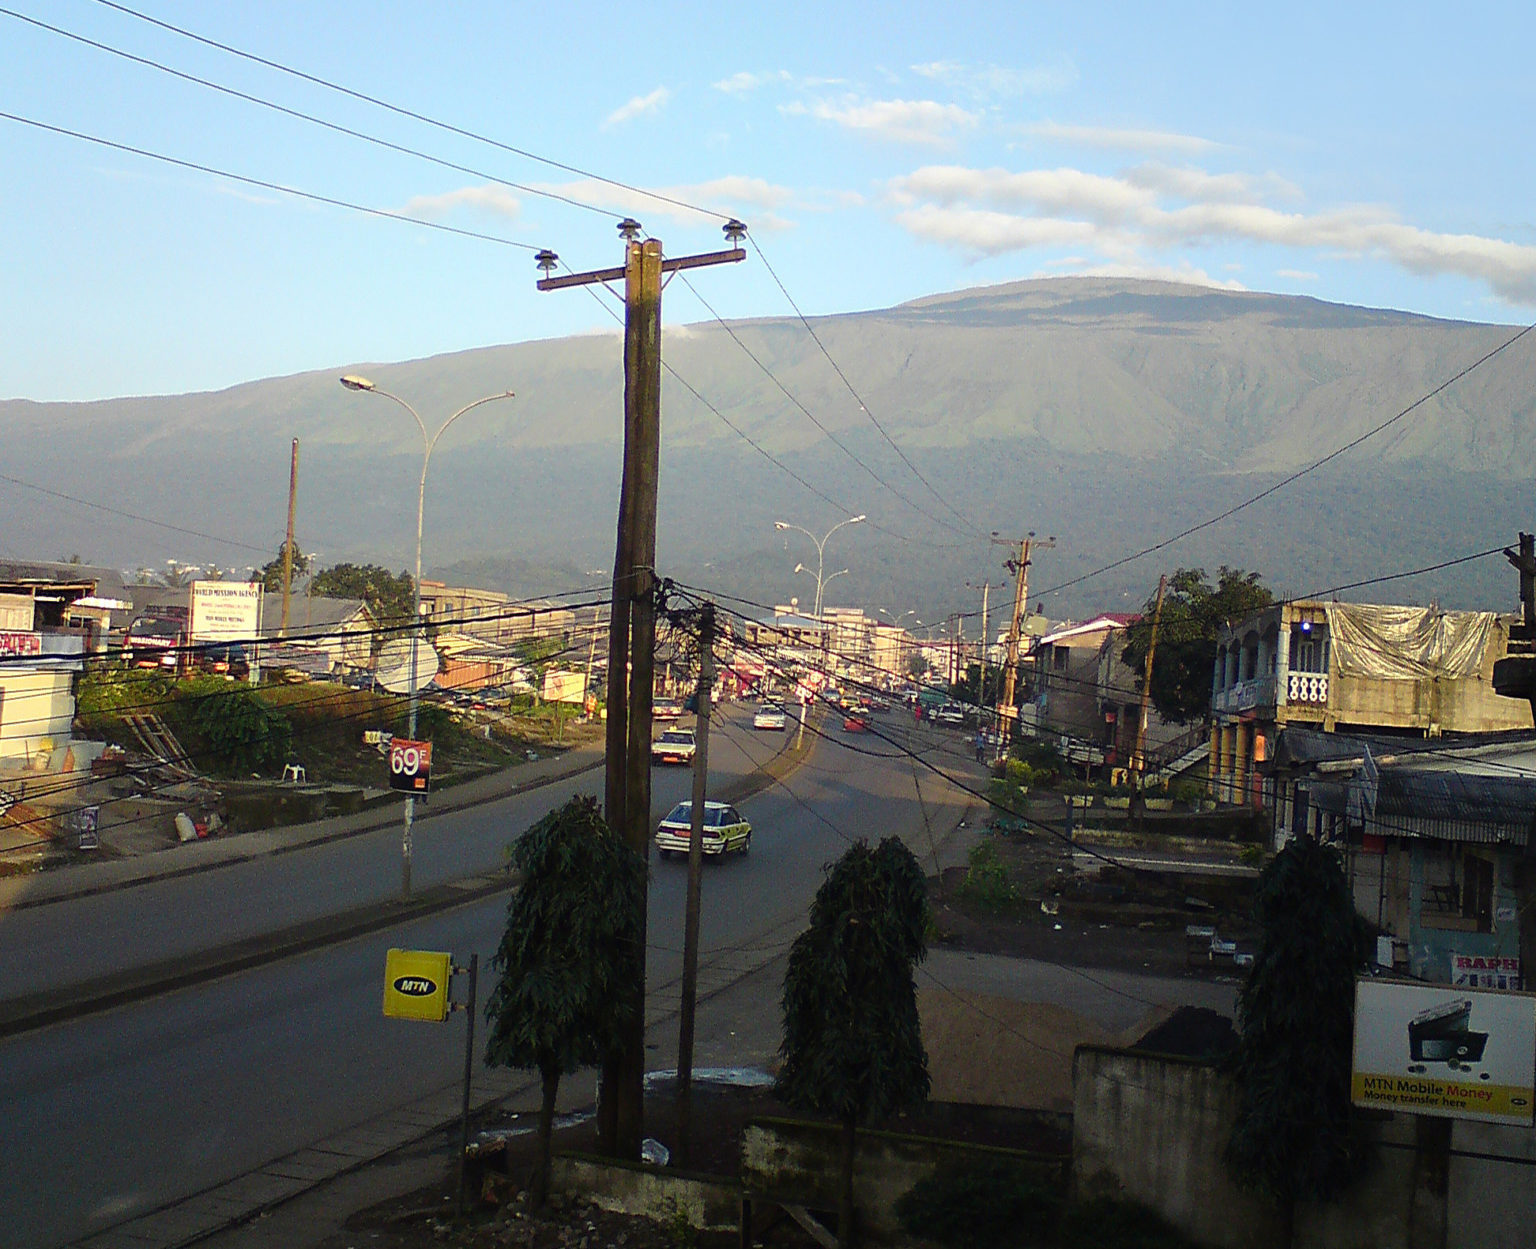 cameroun progresse electrification nord pays - L'Energeek